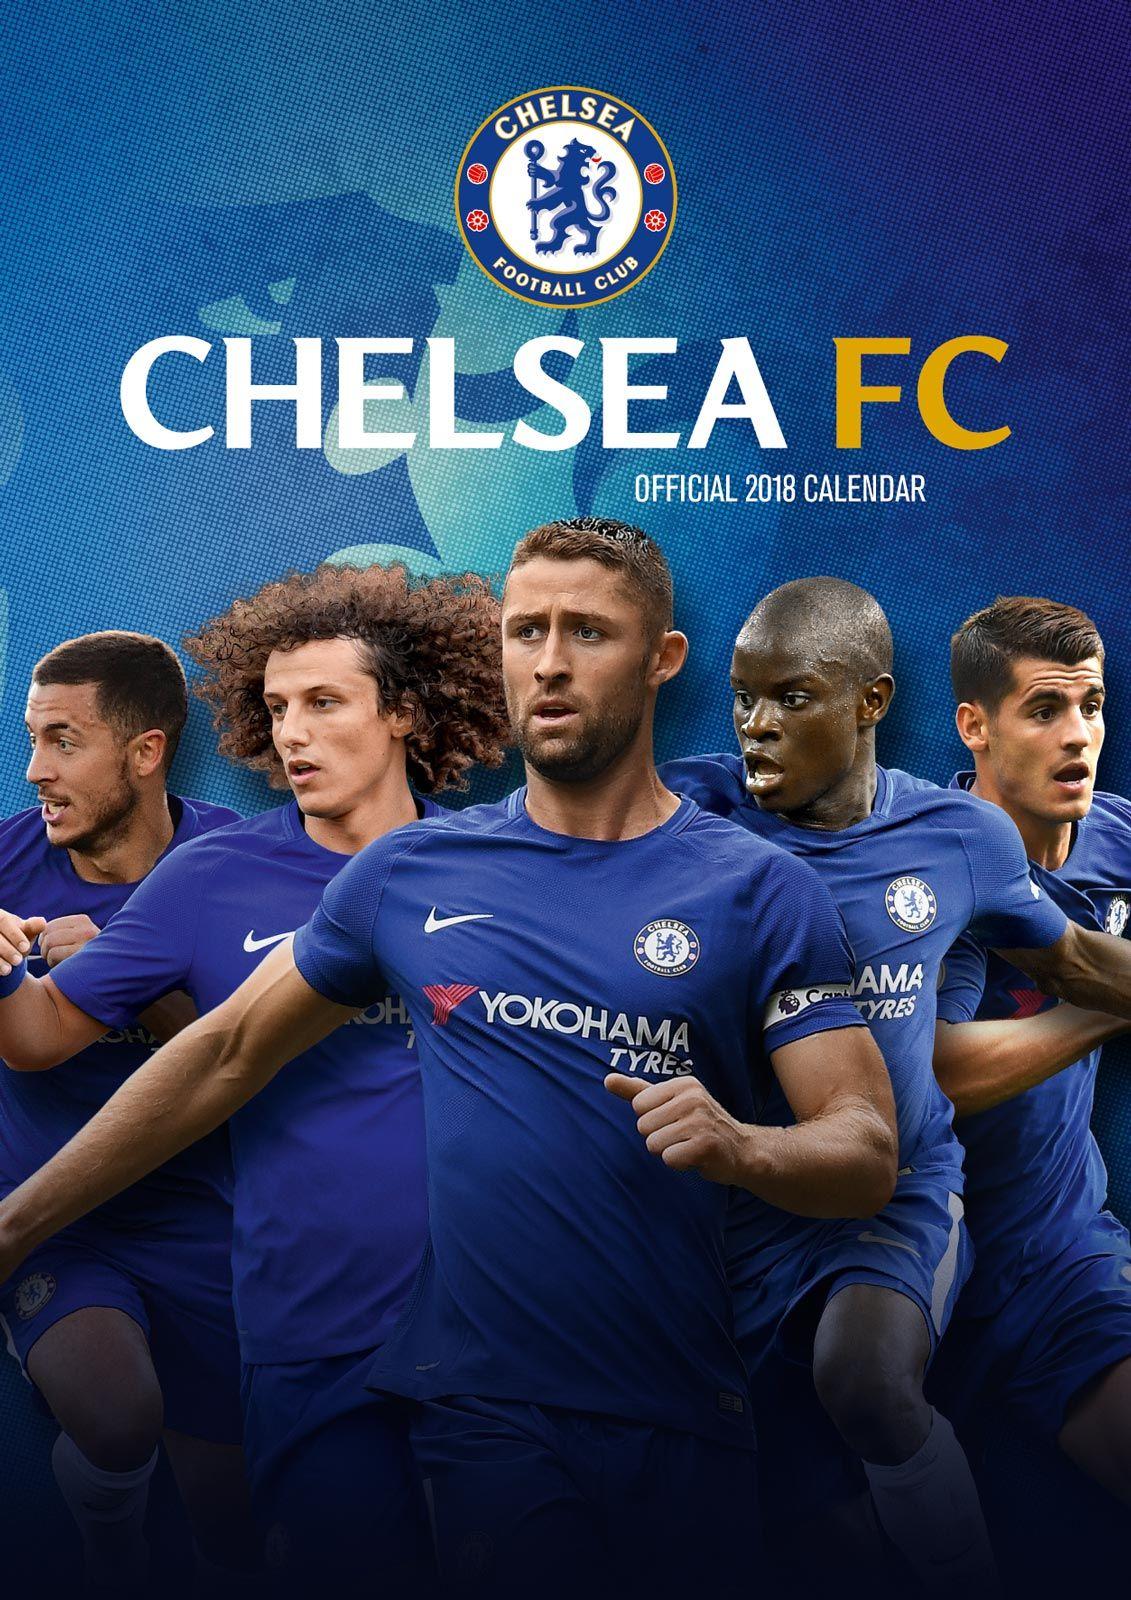 87165647e155 Chelsea - kalendarz 2018